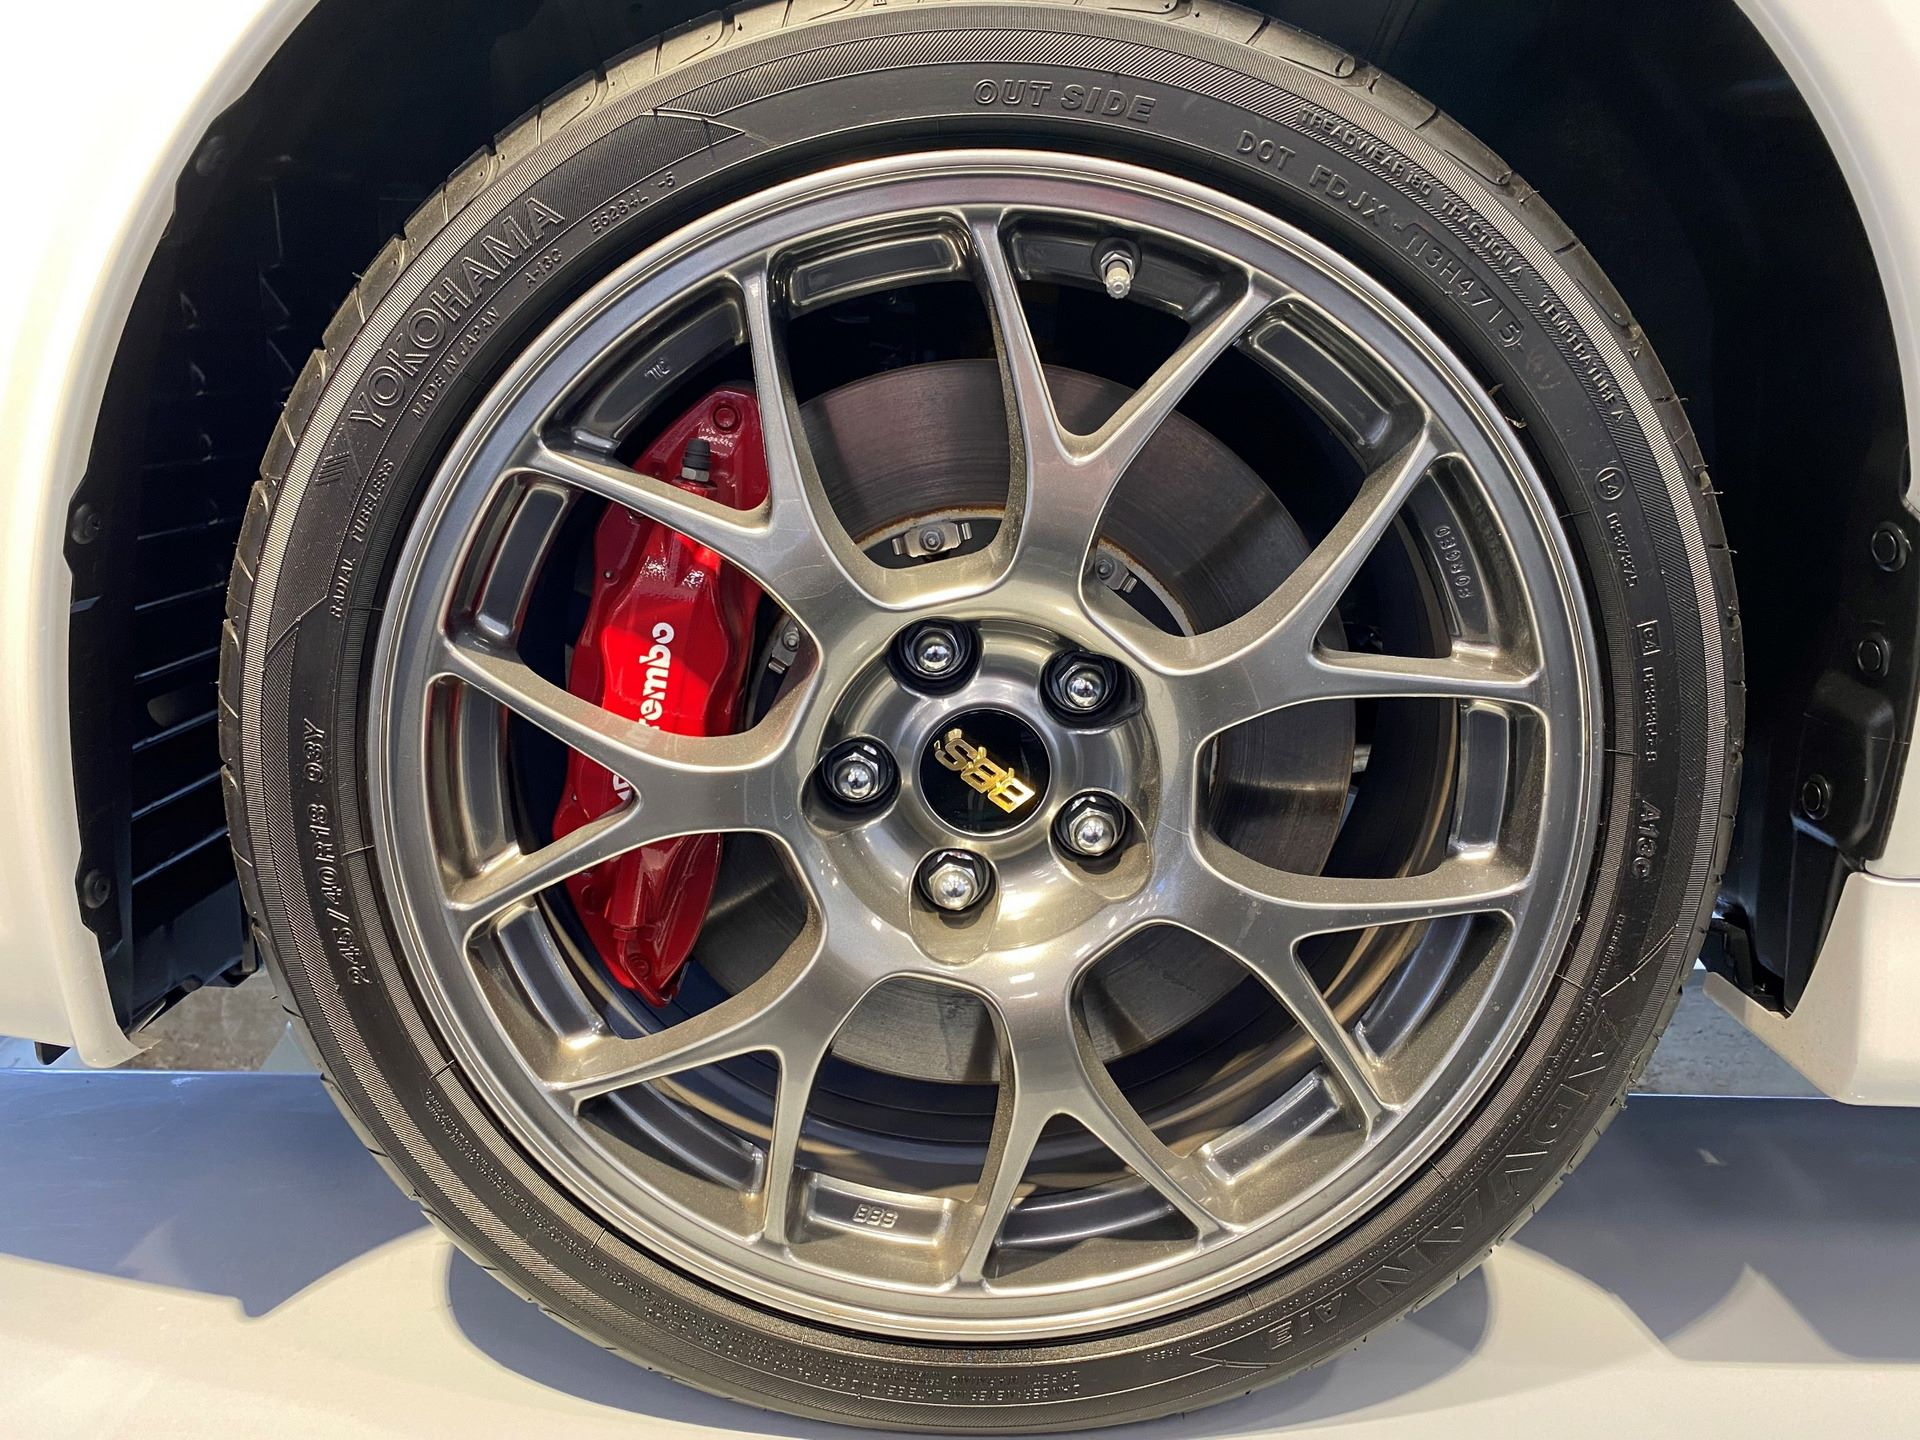 Mitsubishi-Lancer-Evo-Final-Edition-for-sale-10